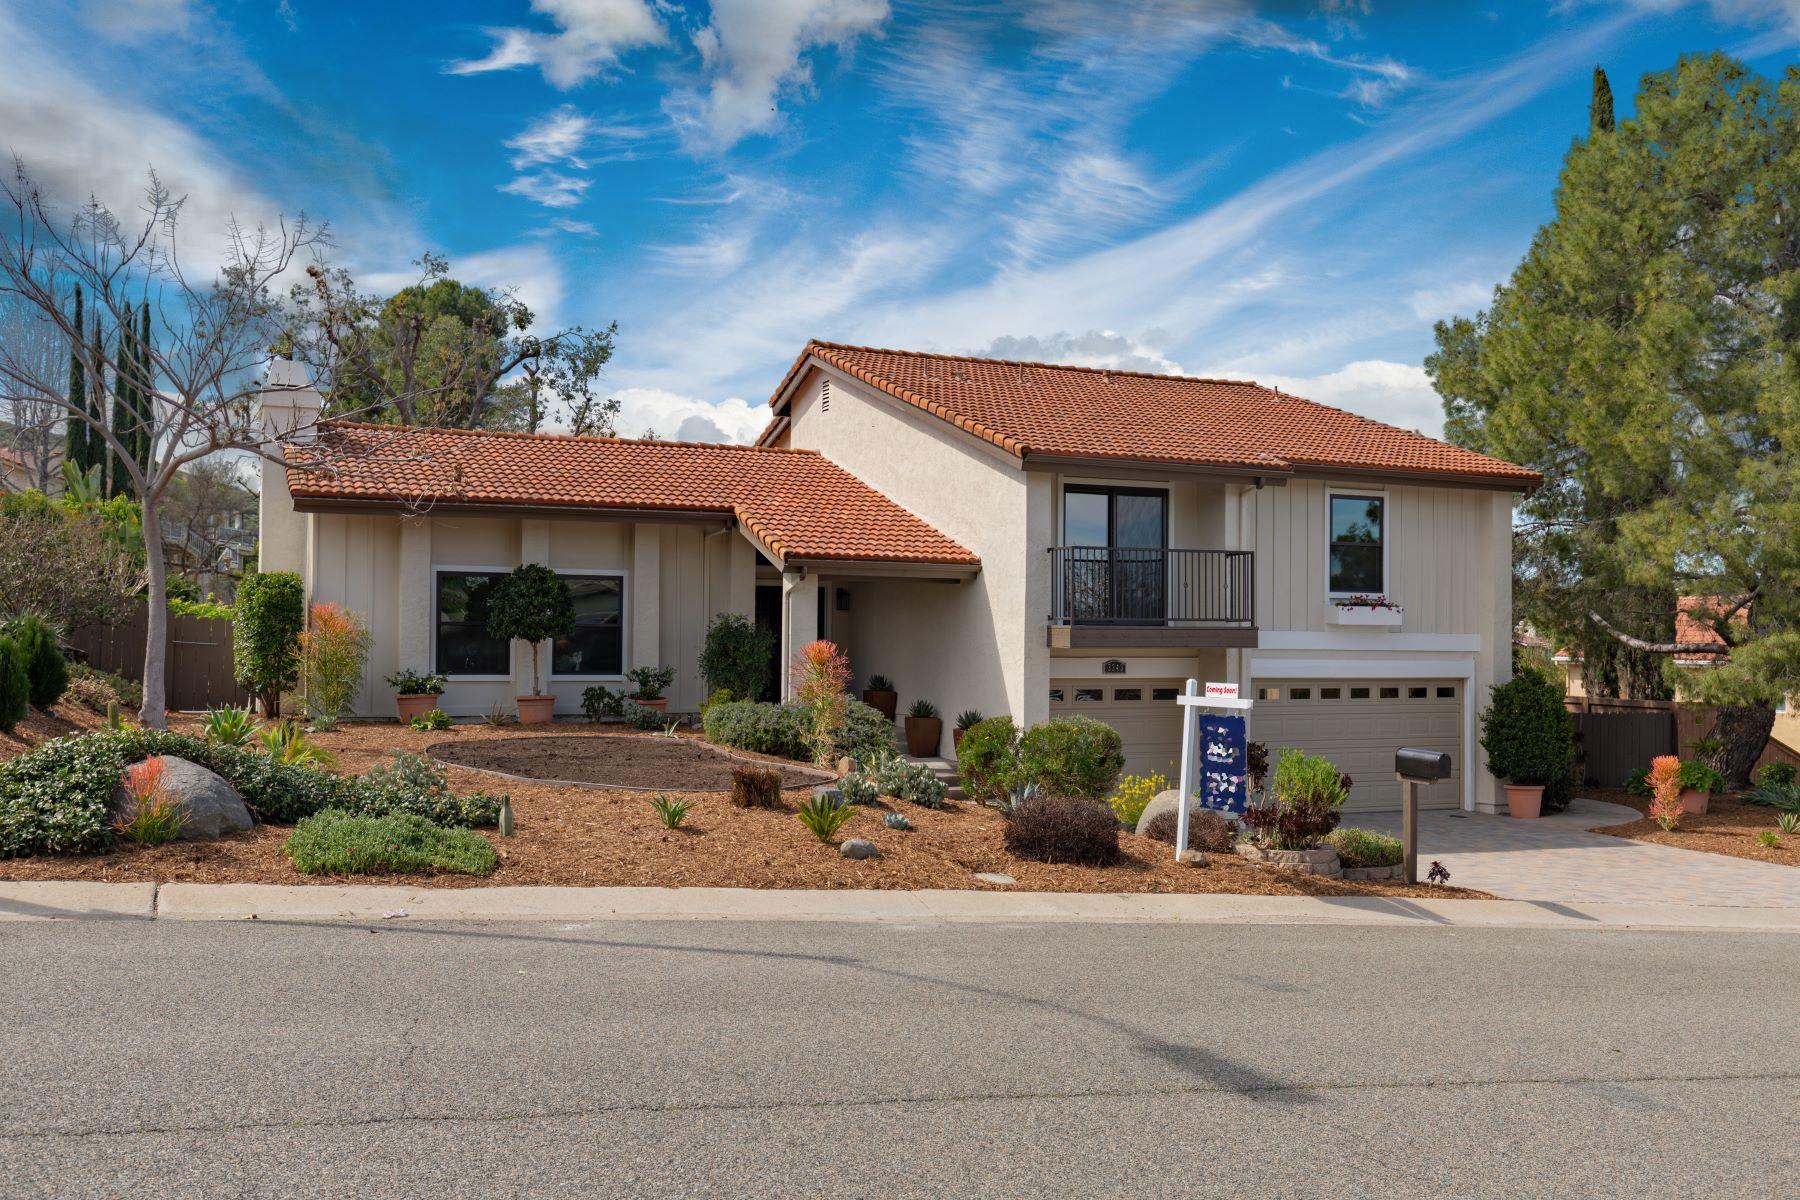 Single Family Home for Active at 3343 Avenida Sierra Escondido, California 92029 United States